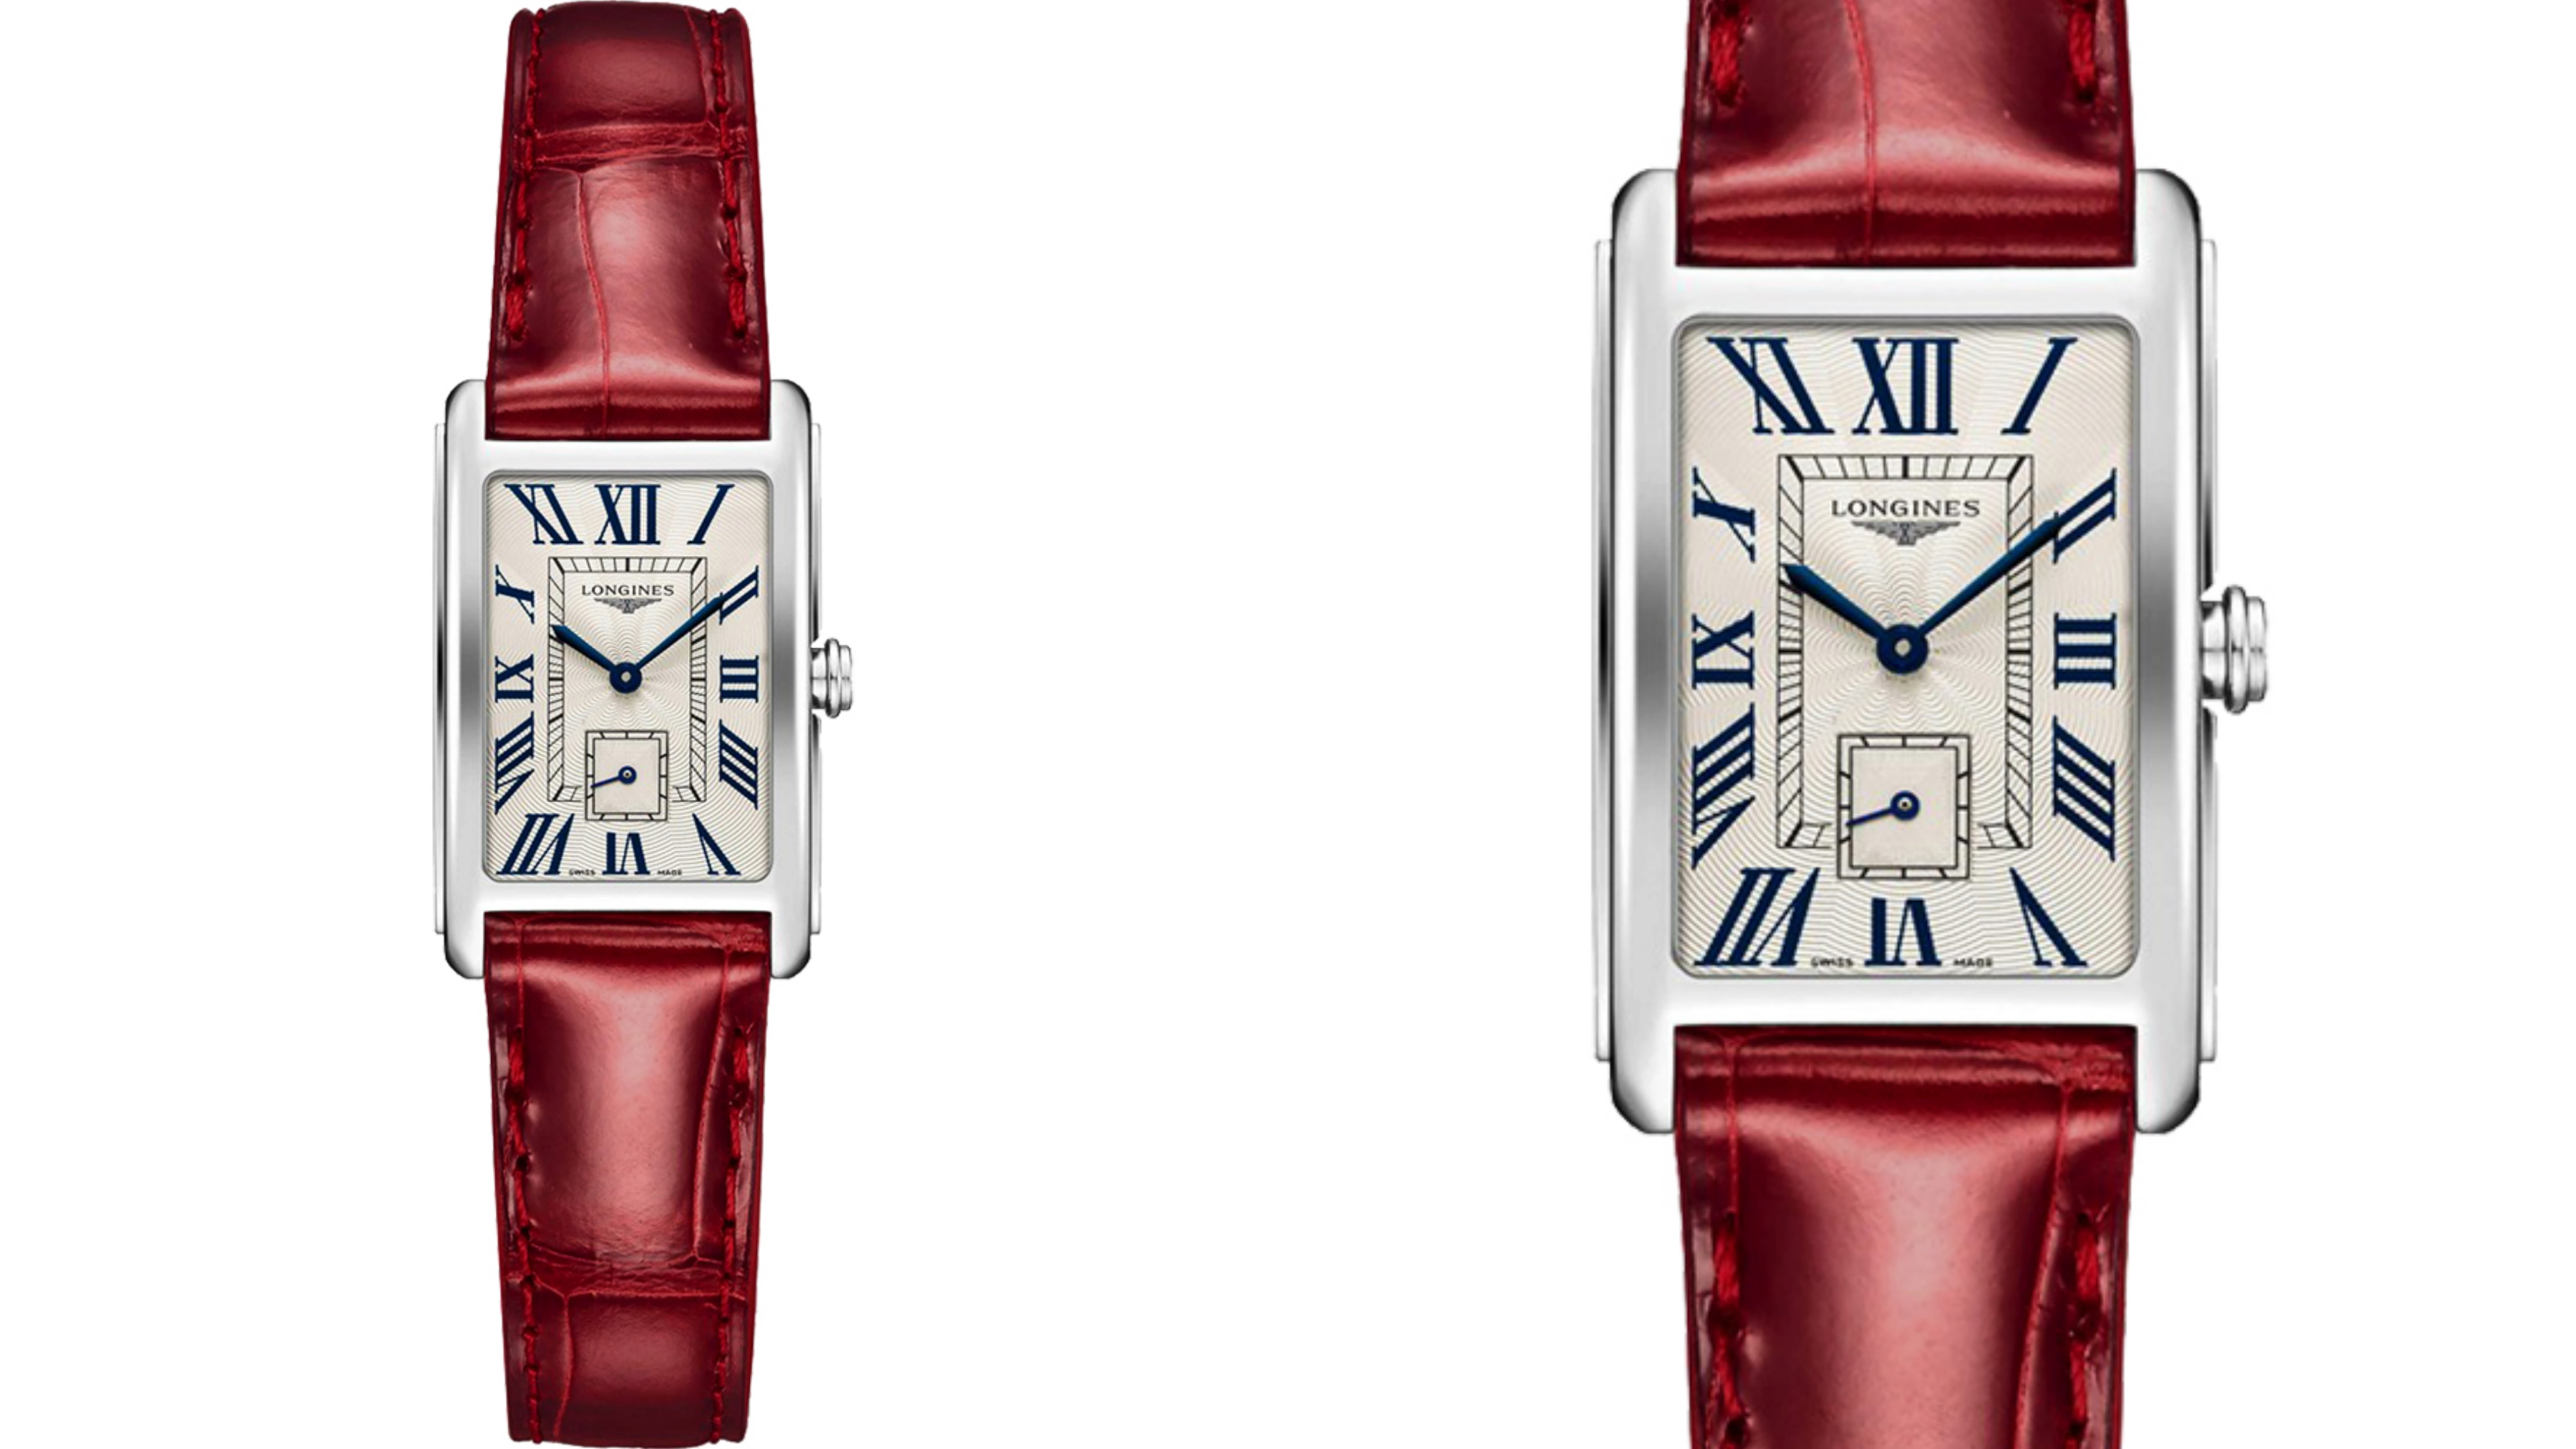 LONGINES DolceVita 獨立小秒針石英女錶-銀x紅/21mm 高規格藍寶石水晶鏡面,風雅尊榮的優質美學,時尚色系搭配鱷魚皮錶帶